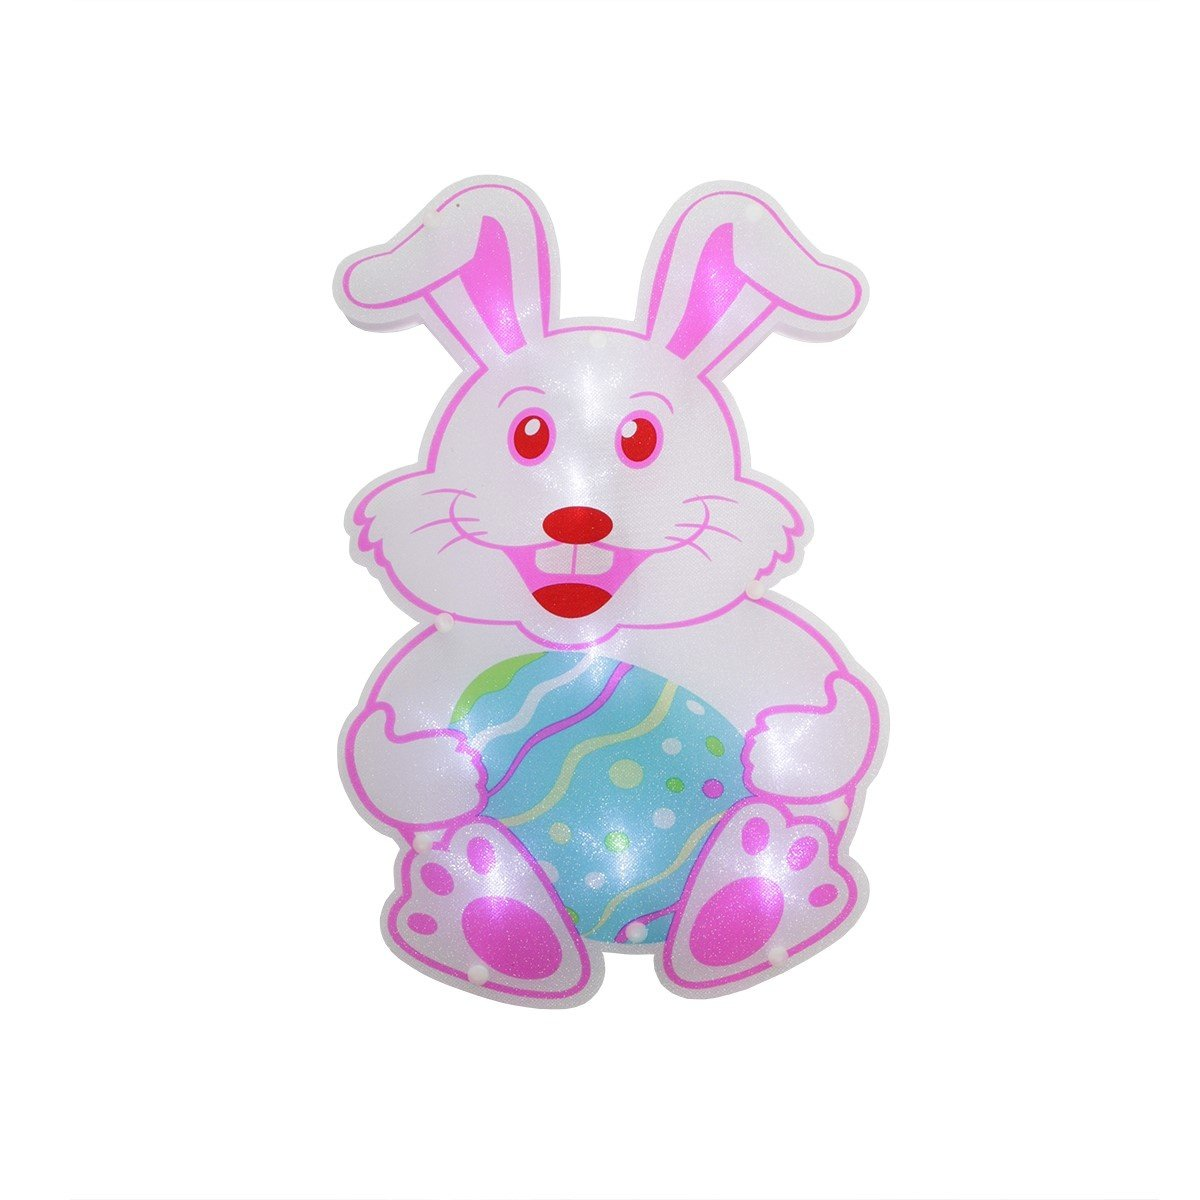 Sienna Lighted Easter Illumination Window Light - Easter Bunny